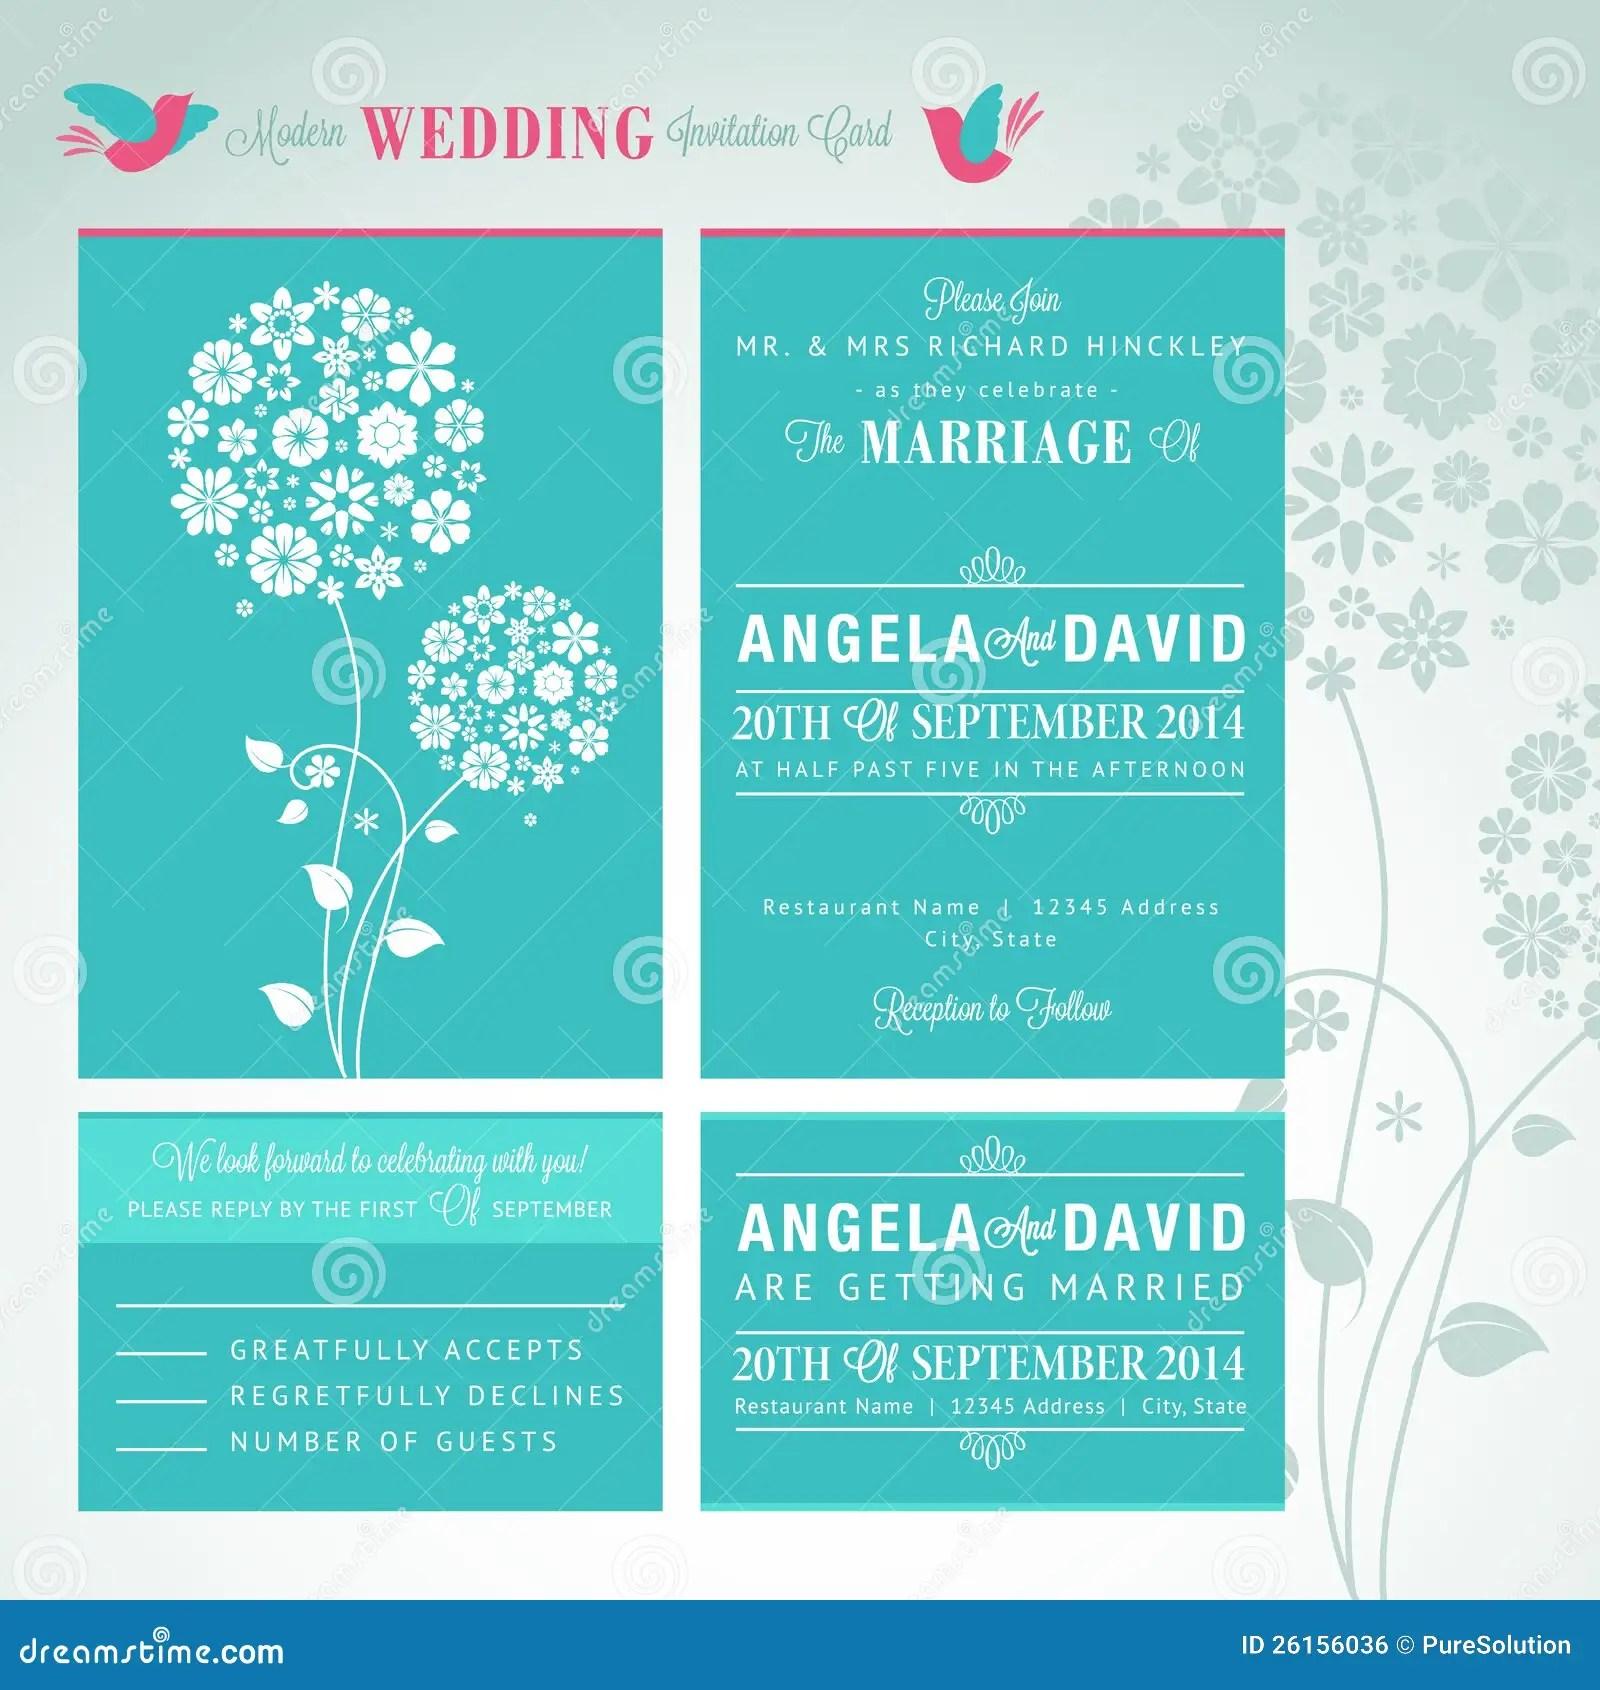 wedding invitation card stock wedding card invitation wedding invitation card stock photos images pictures Wedding invitations